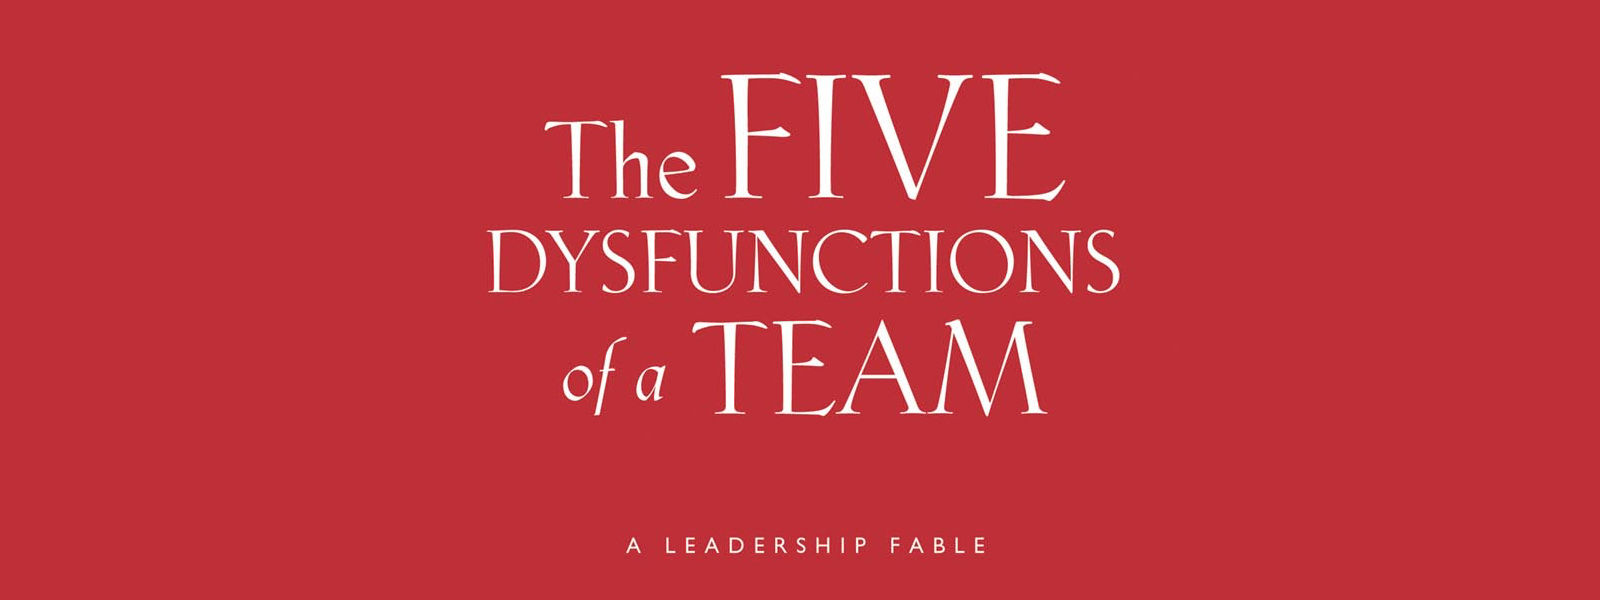 lencioni five dysfunctions of a team pdf